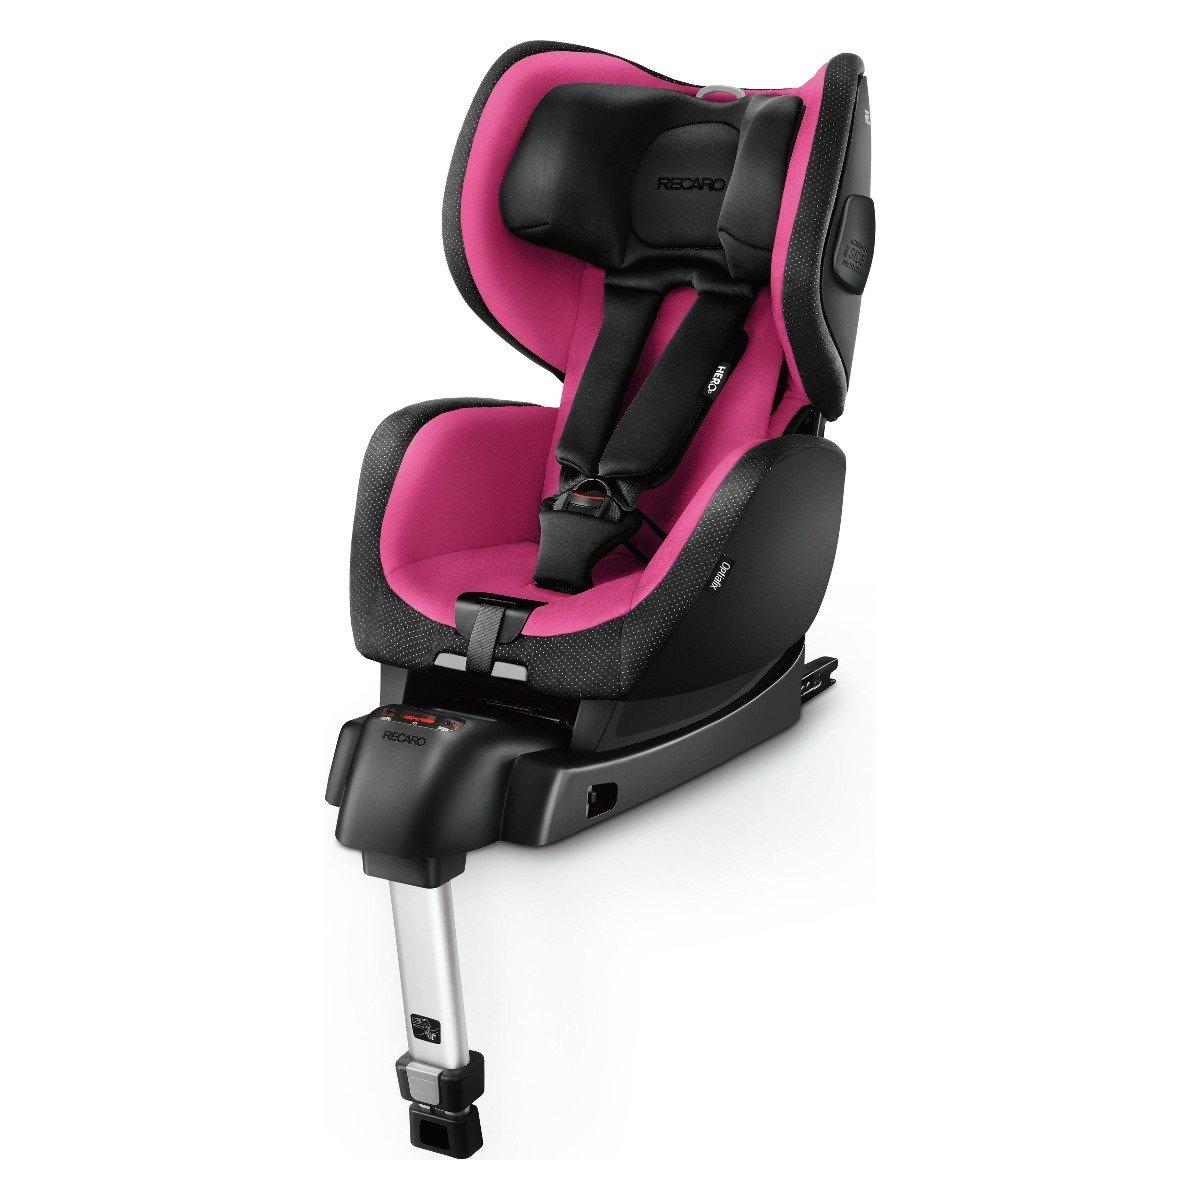 Scaun Auto Cu Isofix Optiafix Recaro Pink